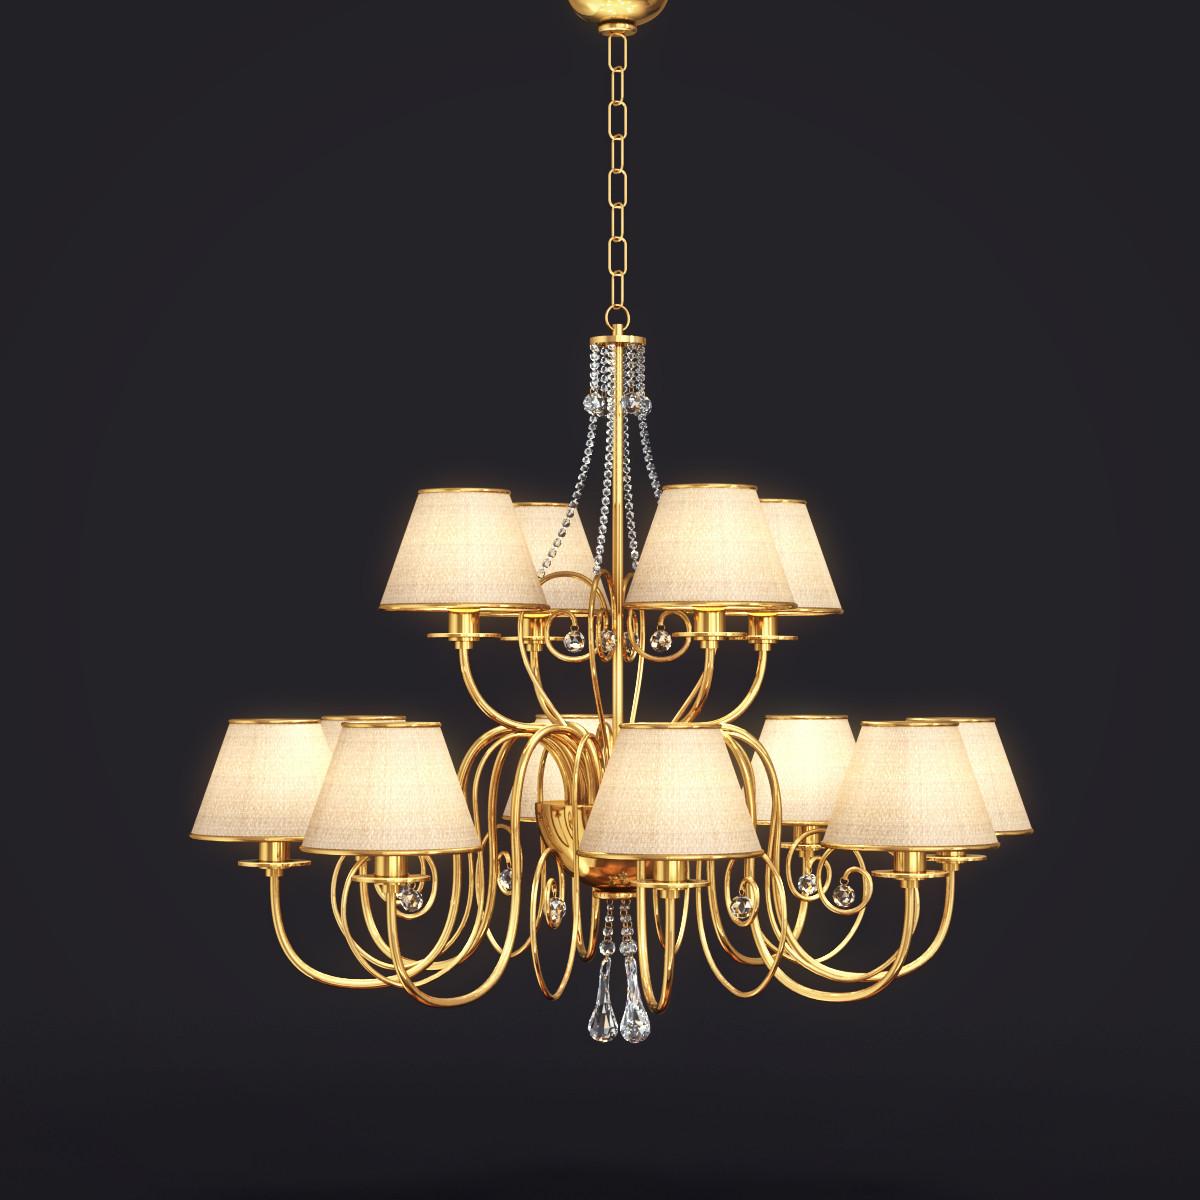 Baga Lamp art 1110 chandelier